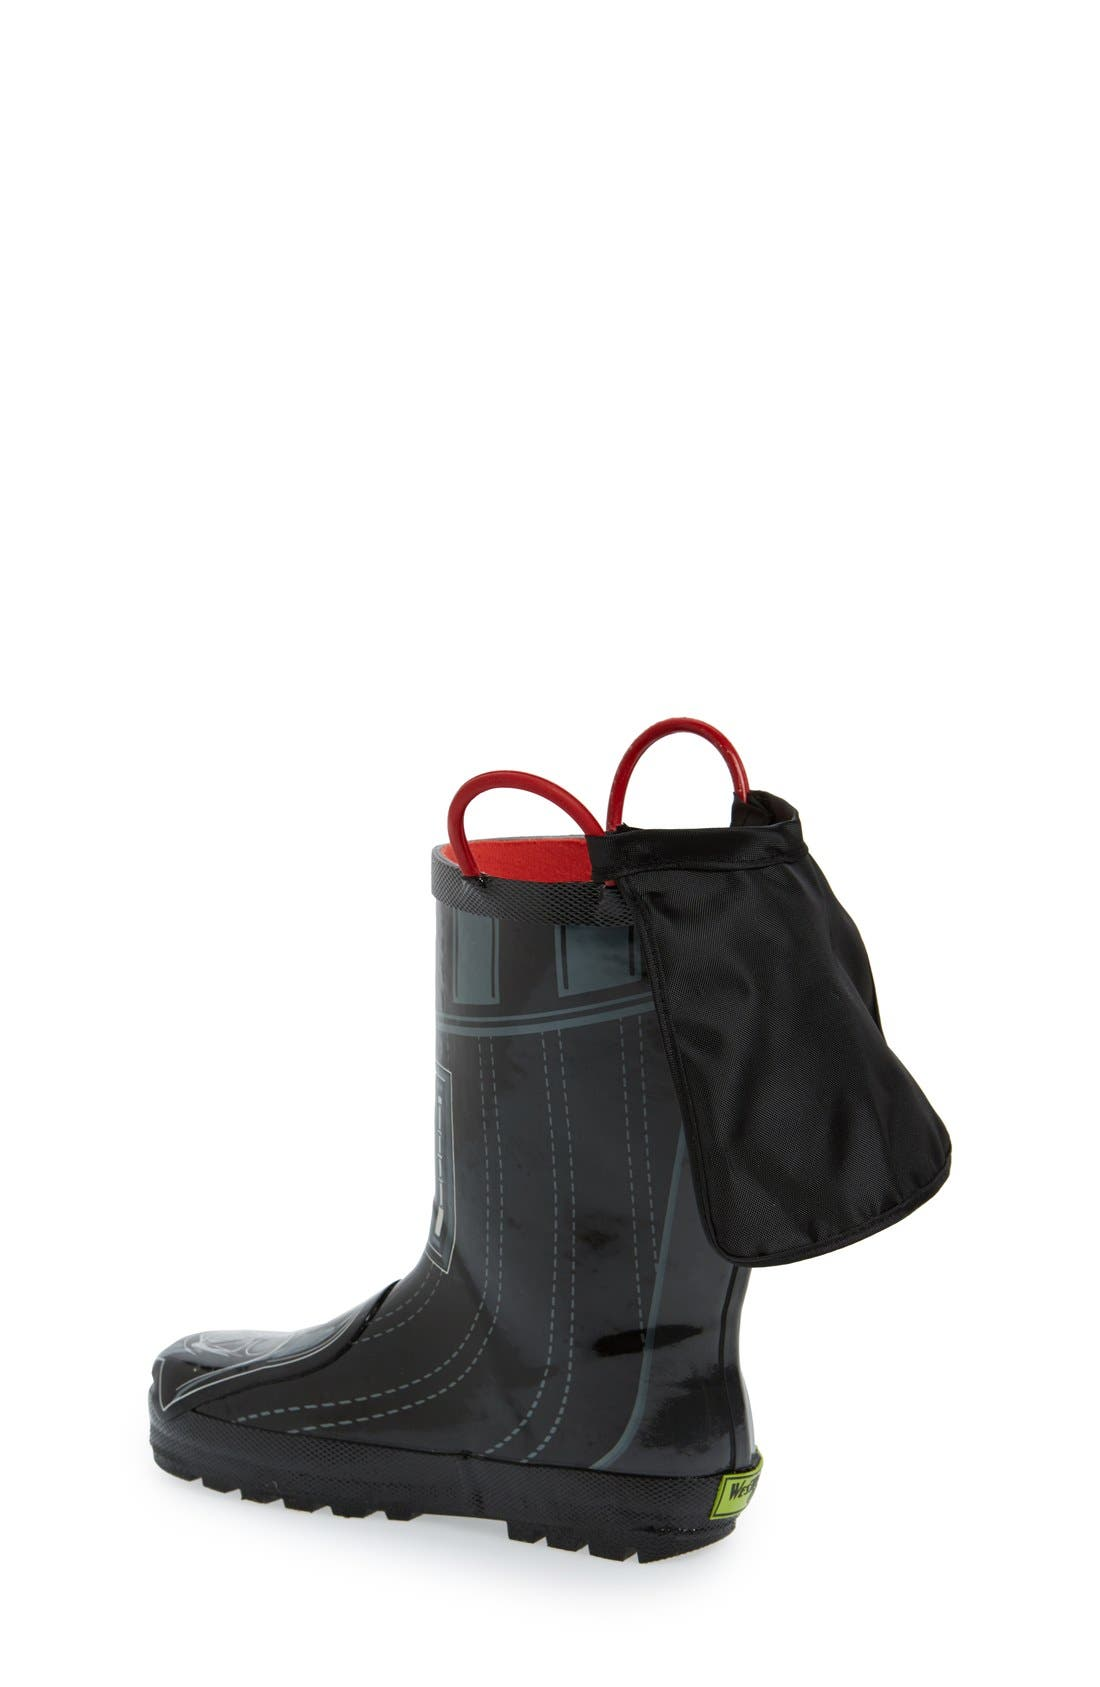 'Star Wars<sup>™</sup> - Darth Vader' Waterproof Rain Boot,                             Alternate thumbnail 2, color,                             Black